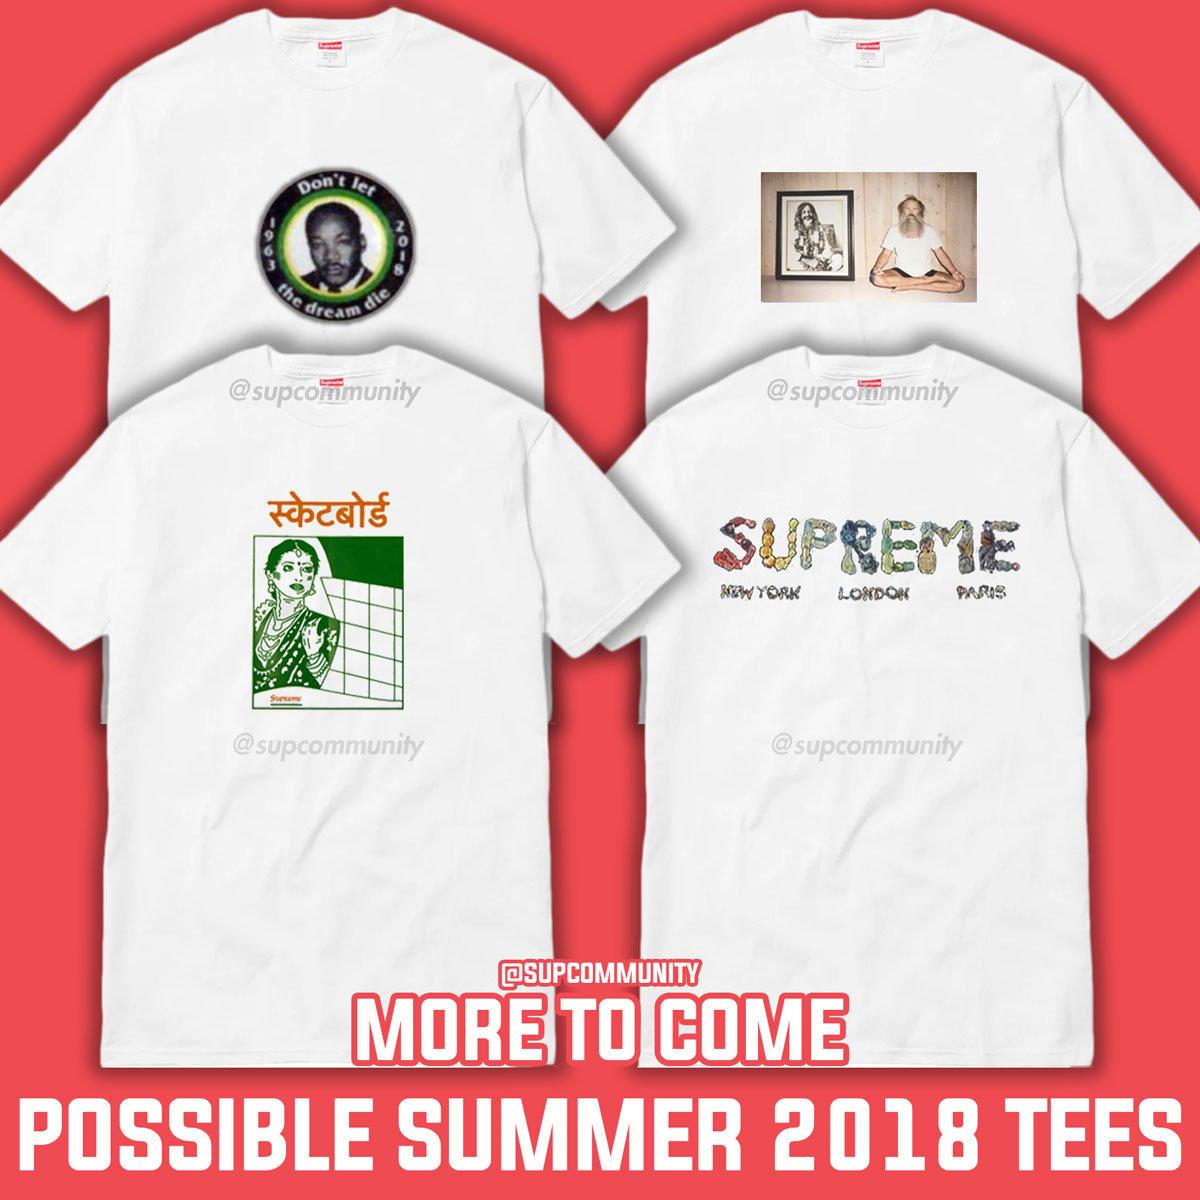 ed215f099 Rumored Supreme Summer 2018 Tees - News - Supremecommunity